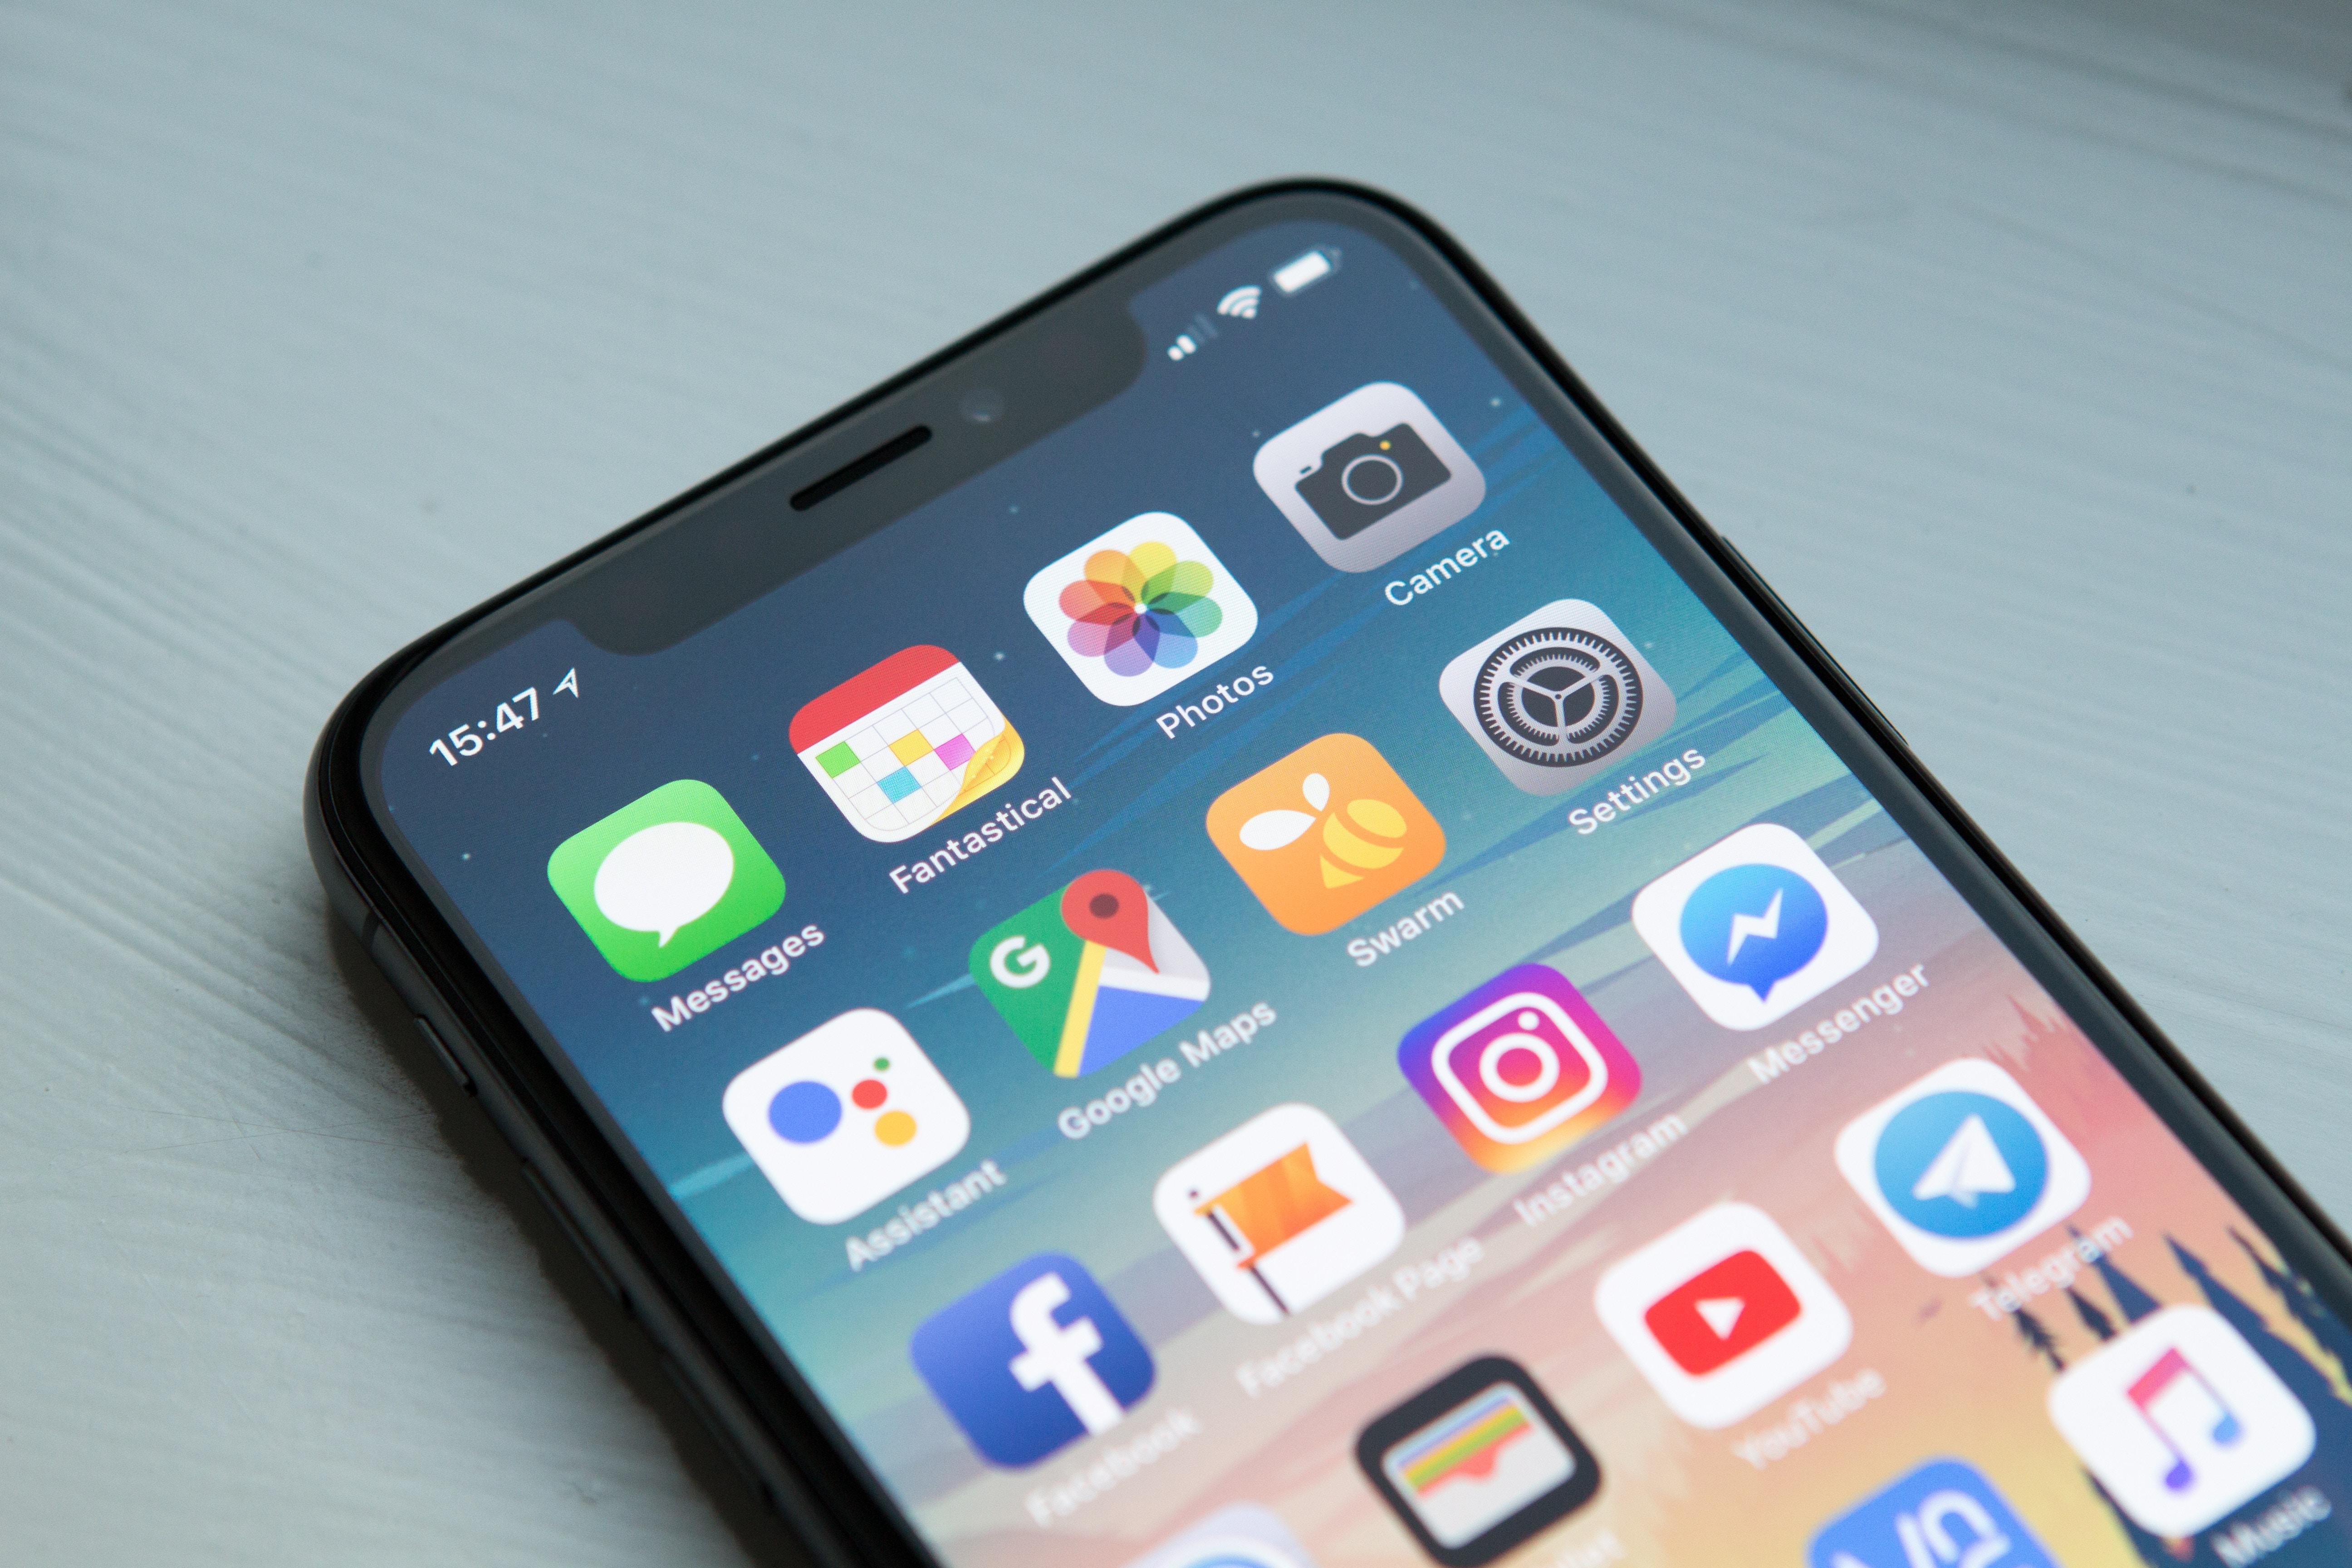 Foto touchscreen smartphone